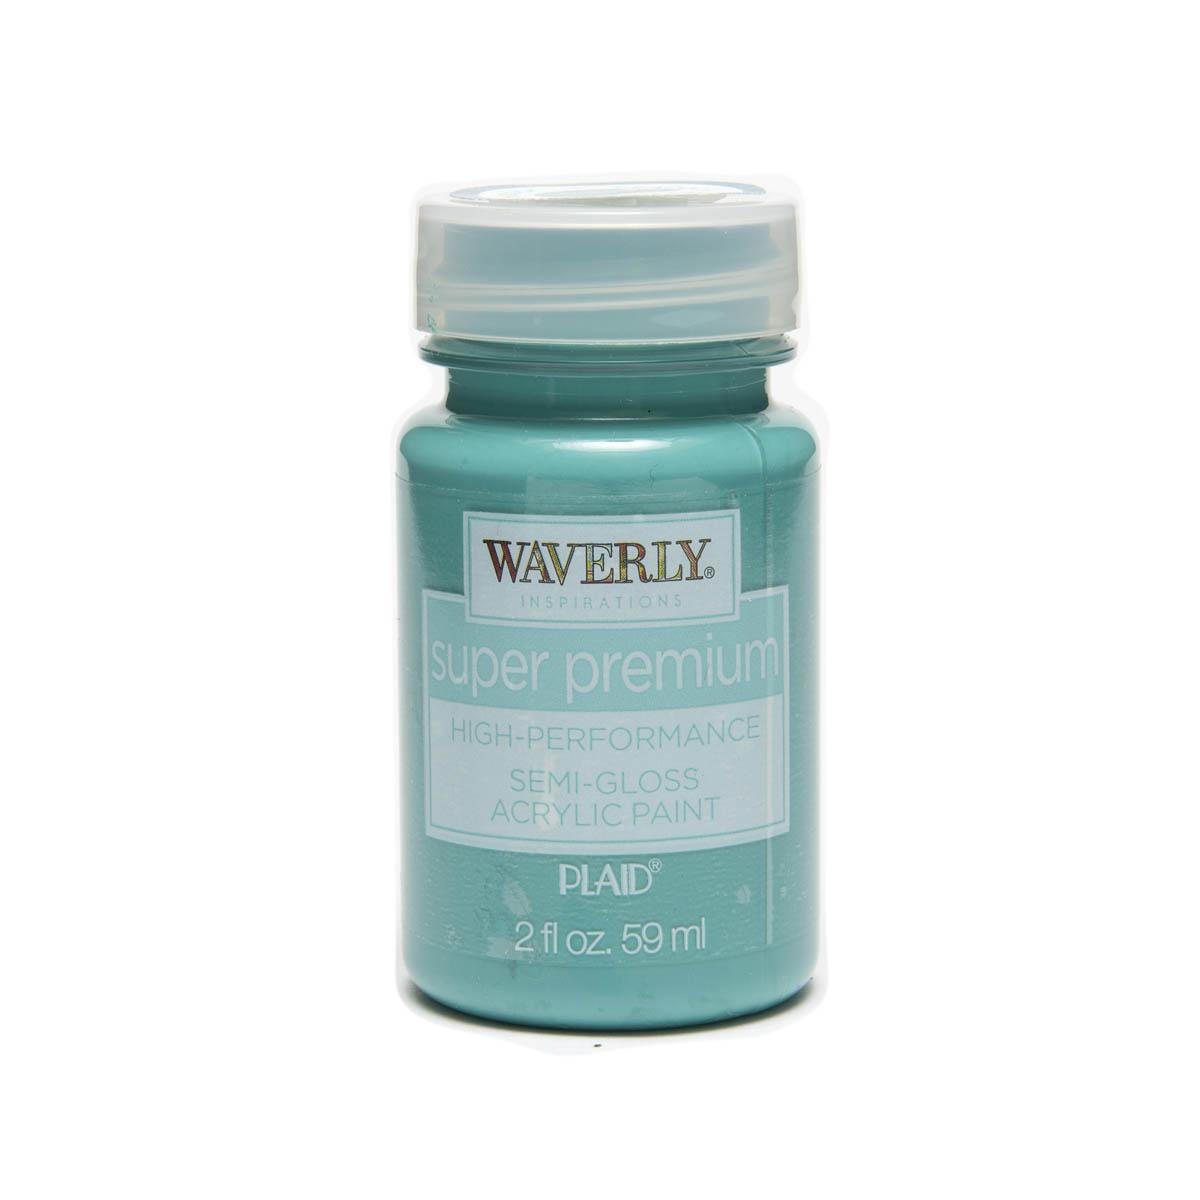 Waverly ® Inspirations Super Premium Semi-Gloss Acrylic Paint - Peacock, 2 oz.